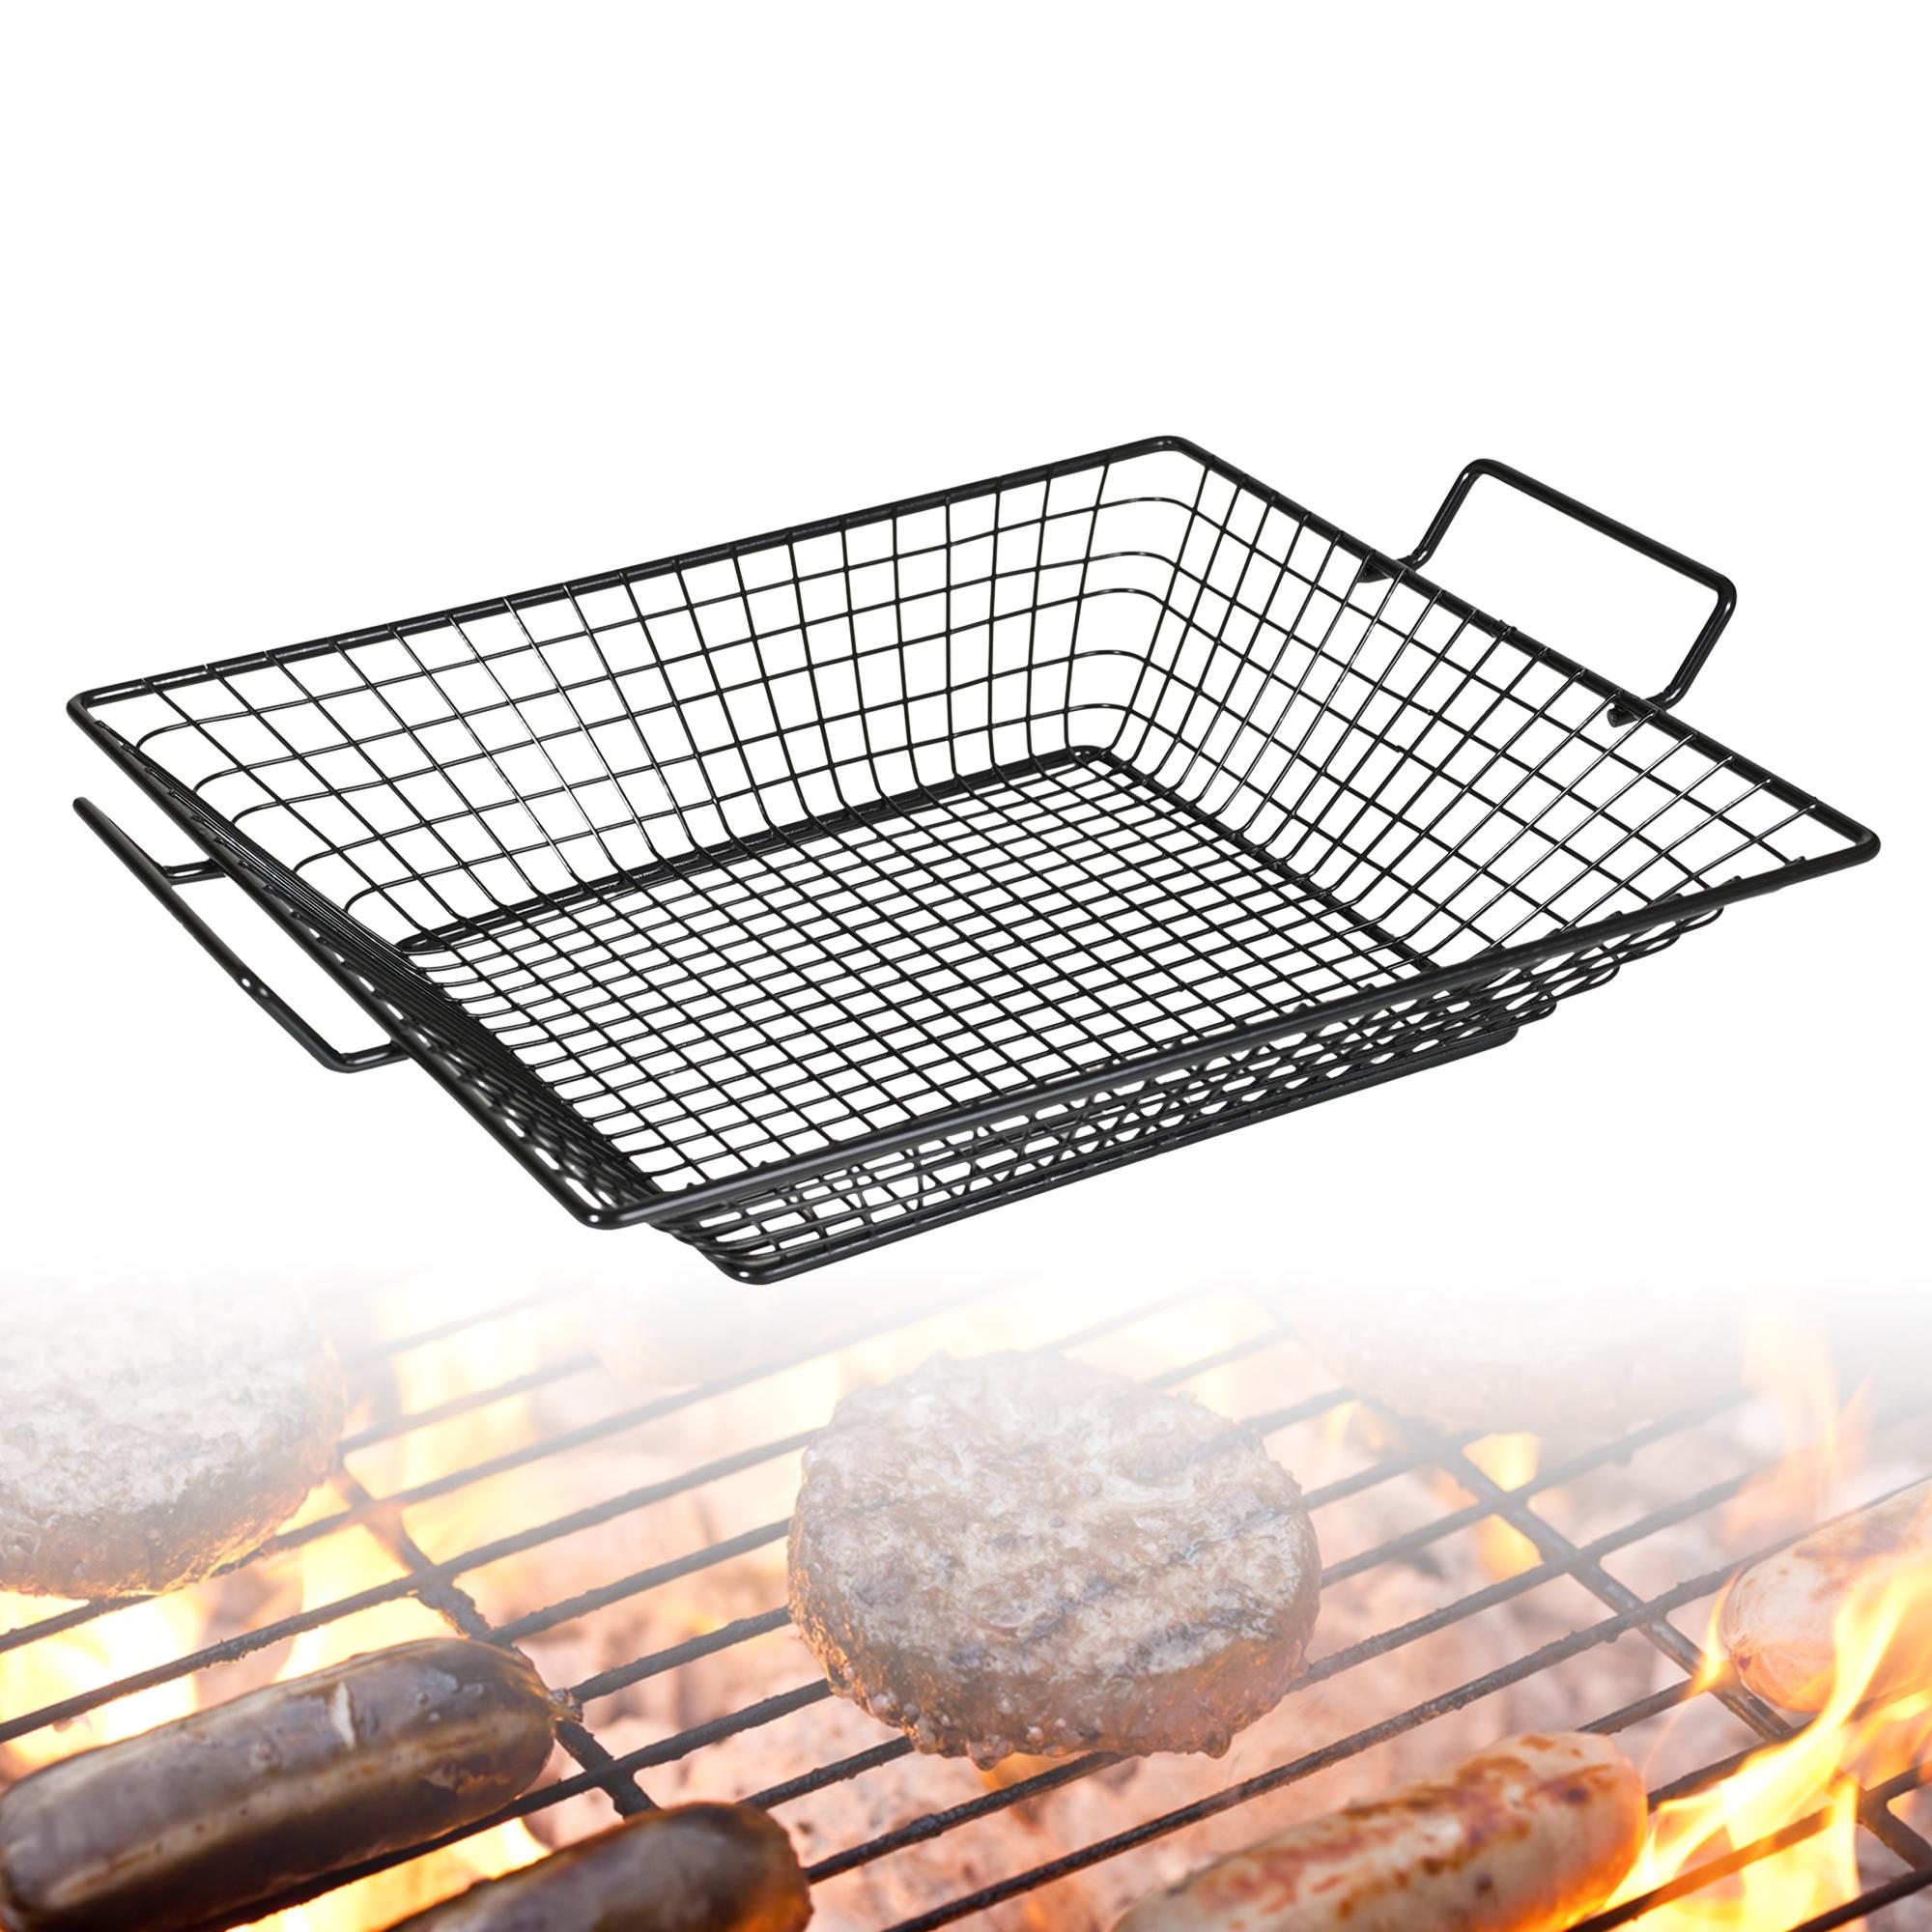 rack swaptop wid iron hei cast grill coleman grate roadtrip